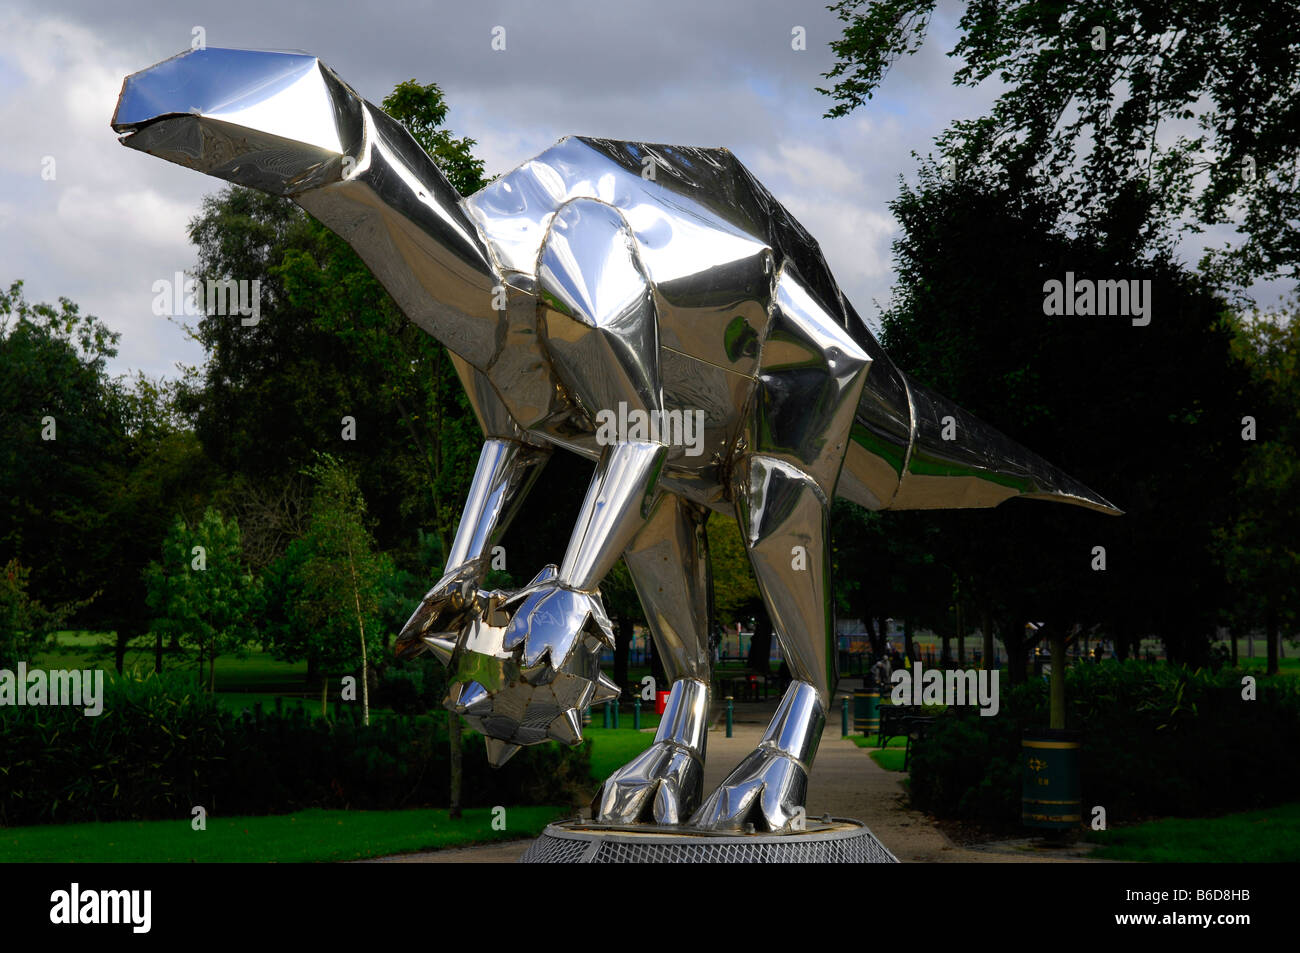 metallic shiny silver dinosaur sculpture - Stock Image